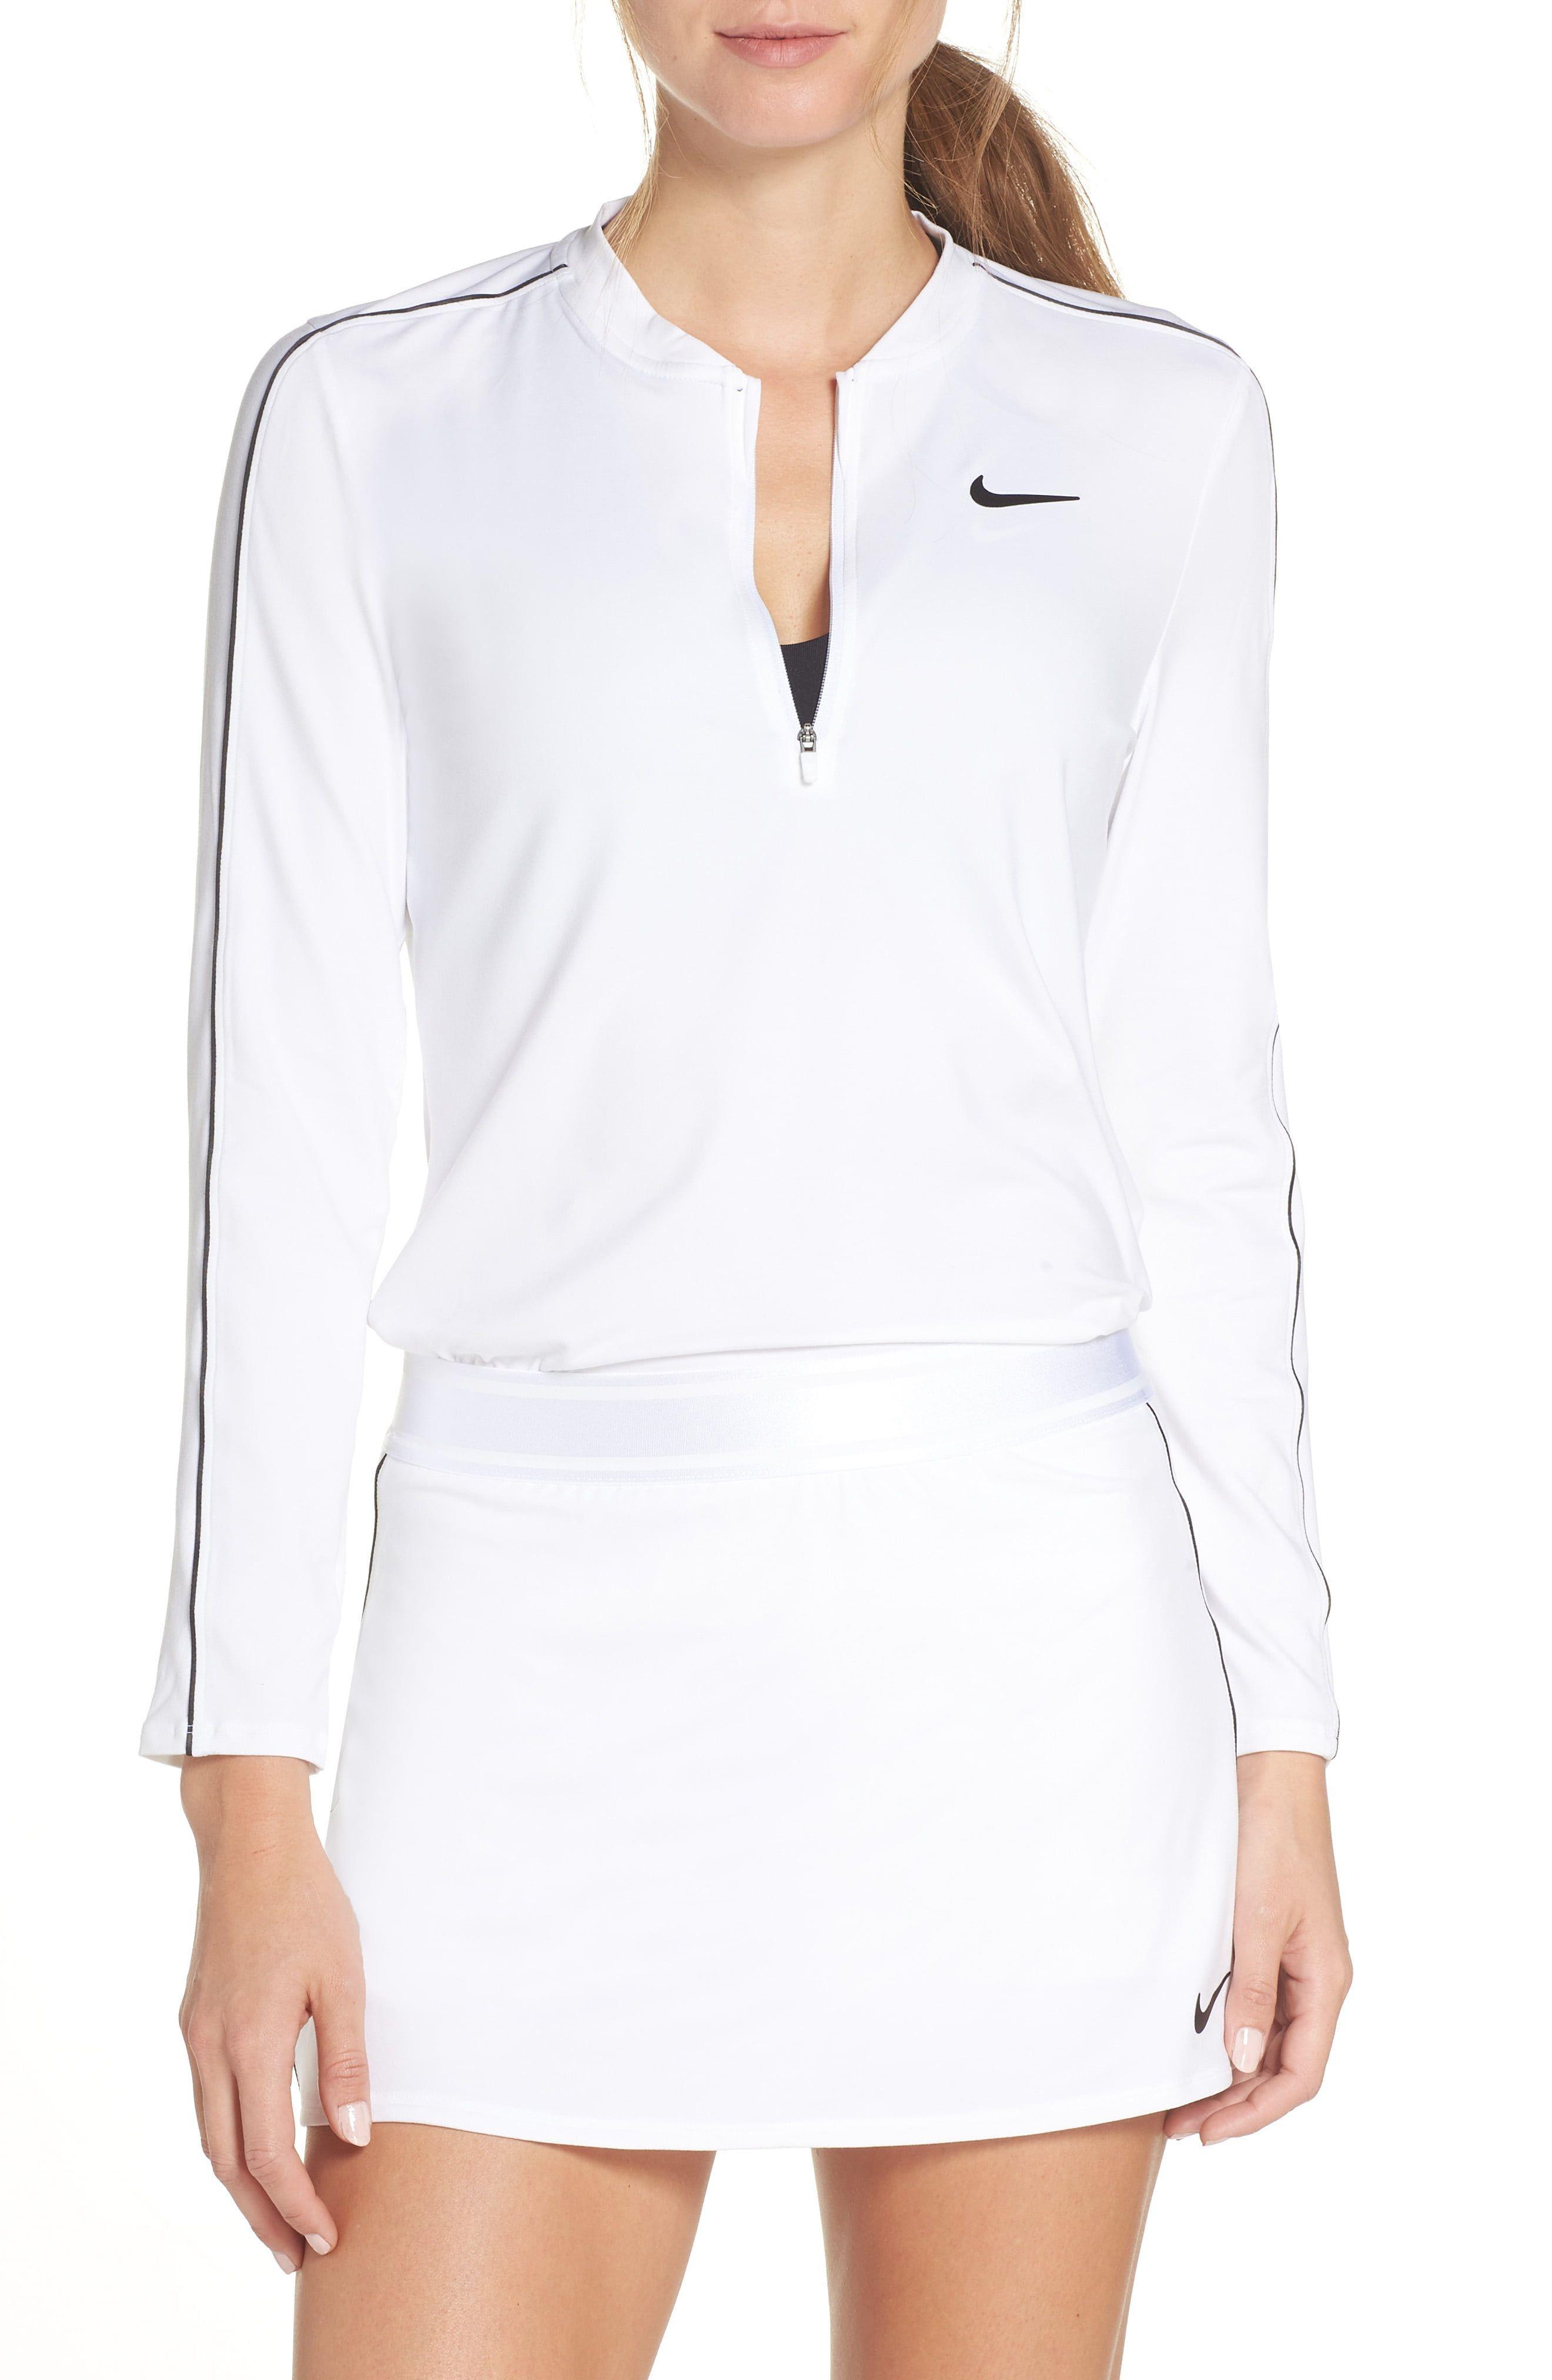 Women S Nike Court Dri Fit Quarter Zip Top Size X Small White Quarter Zip Jacket Quarter Zip Pullover Fashion Clothes Women